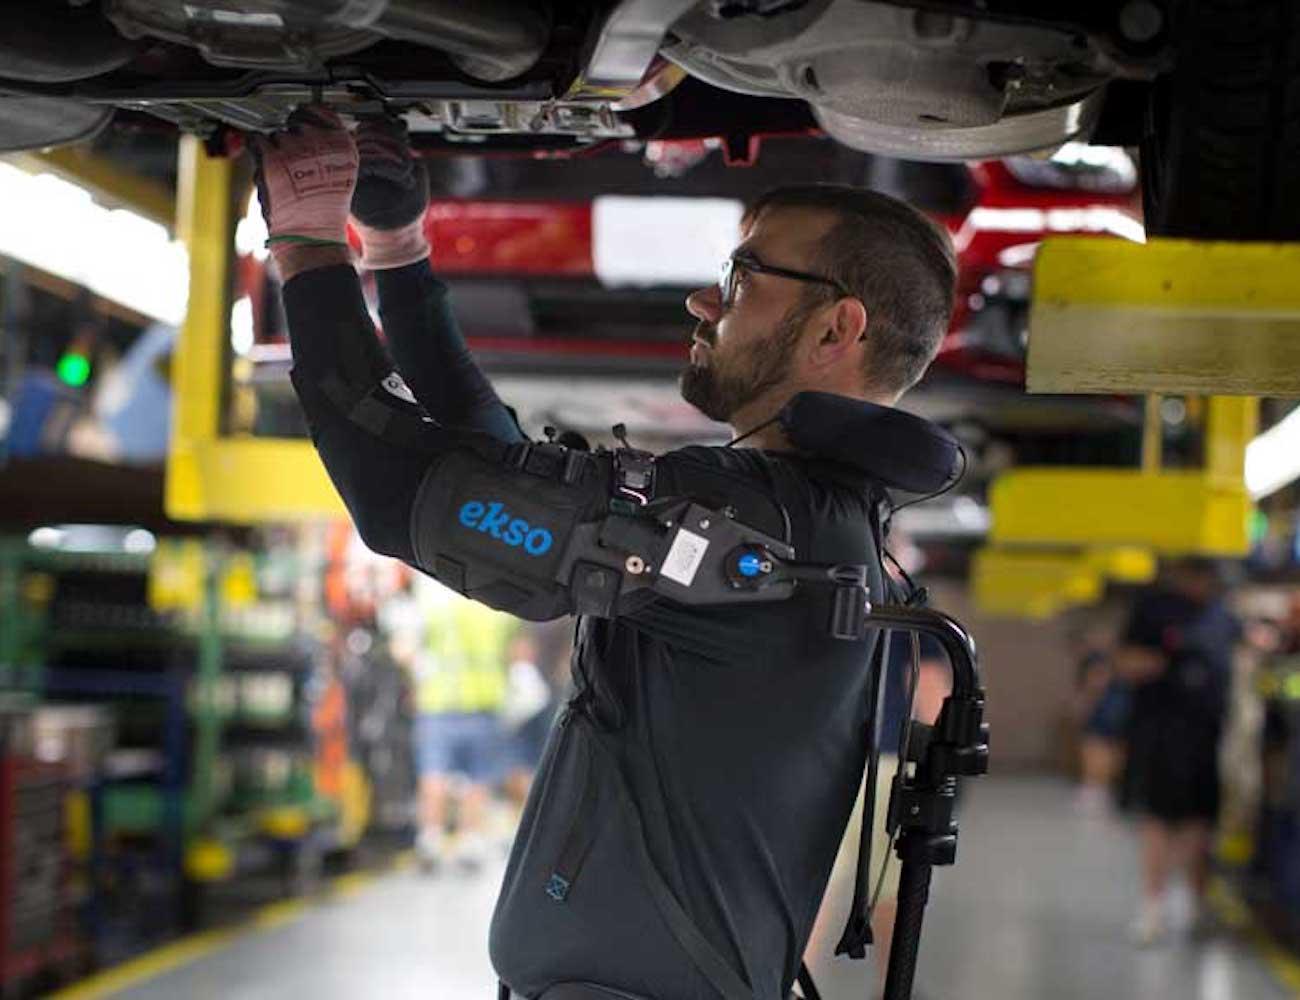 Ekso Bionics Robotic Exoskeleton Vest